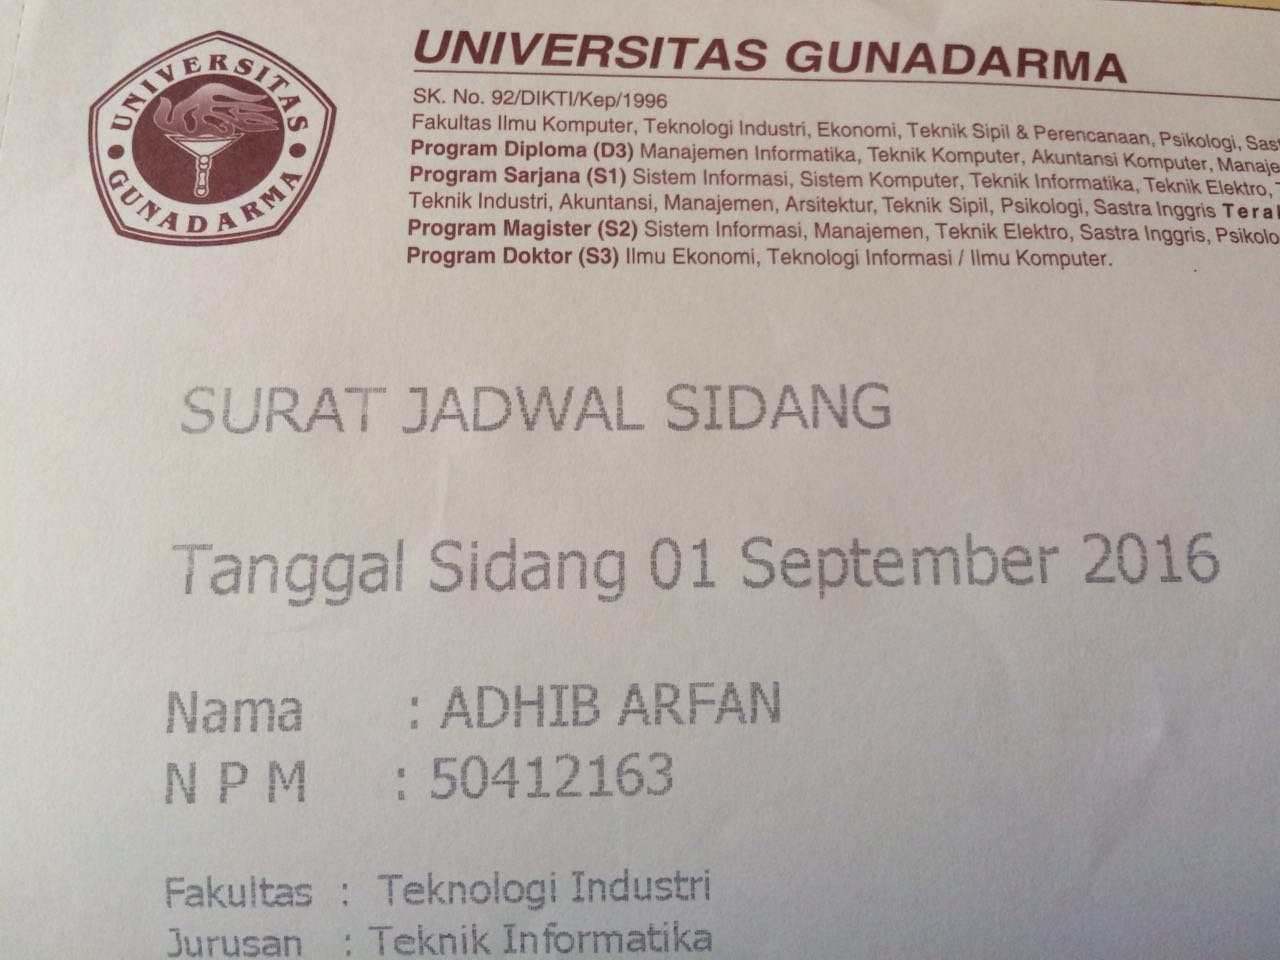 Sidang Skripsi 1 September 2016 Catatan Adhib Arfan